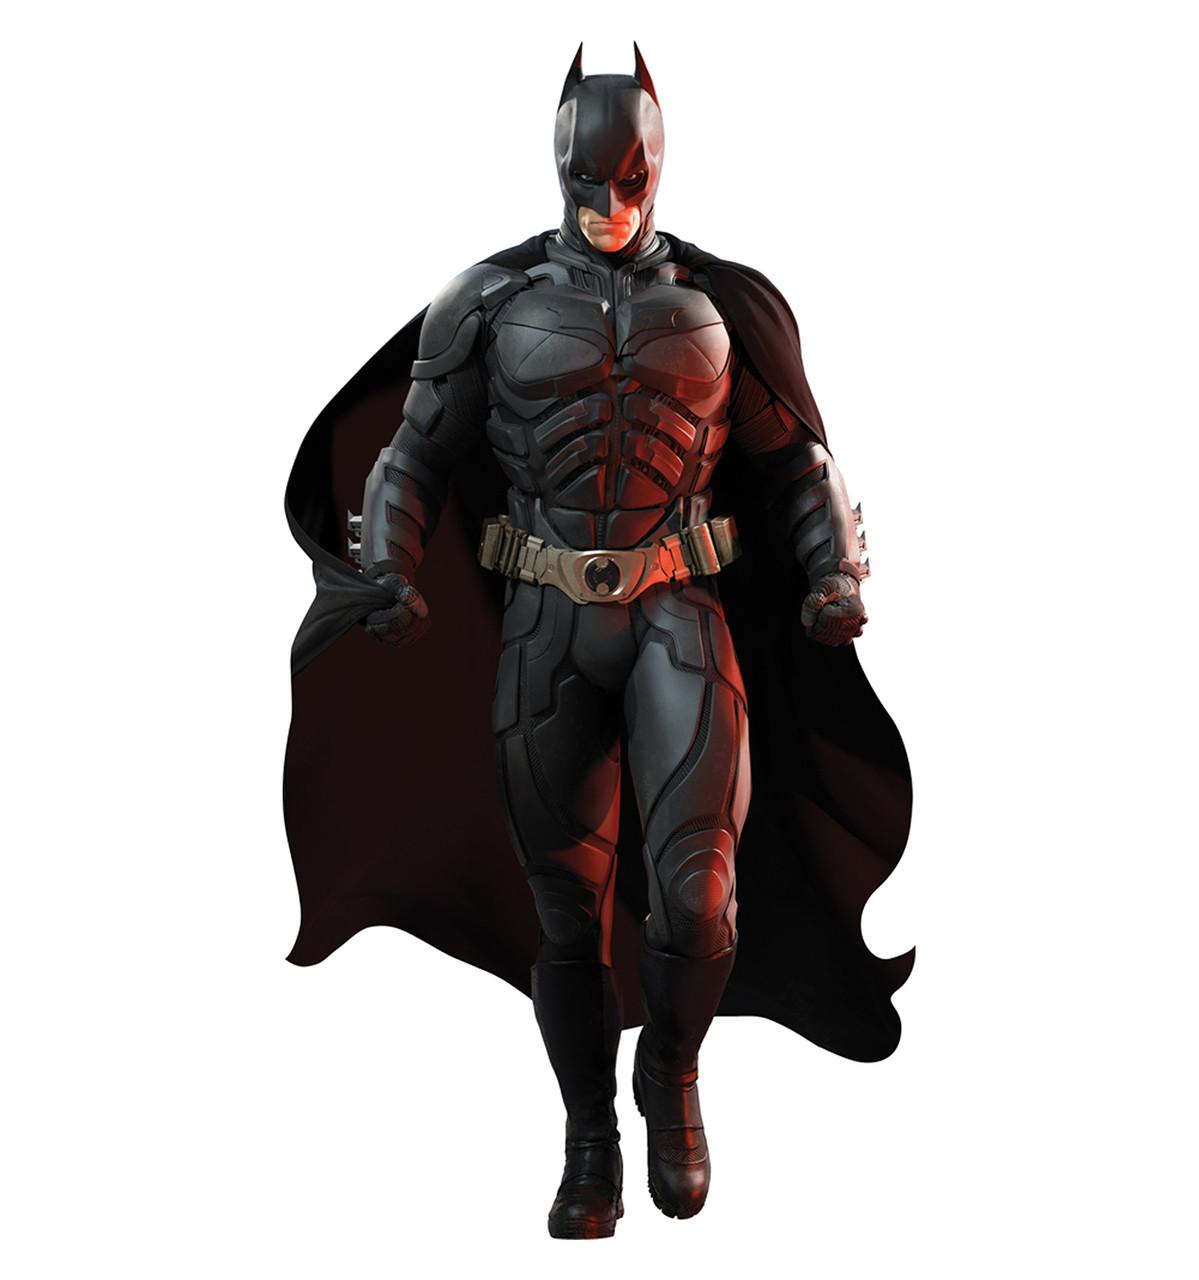 Batman - Dark Knight Rises Cardboard Cutout Front View